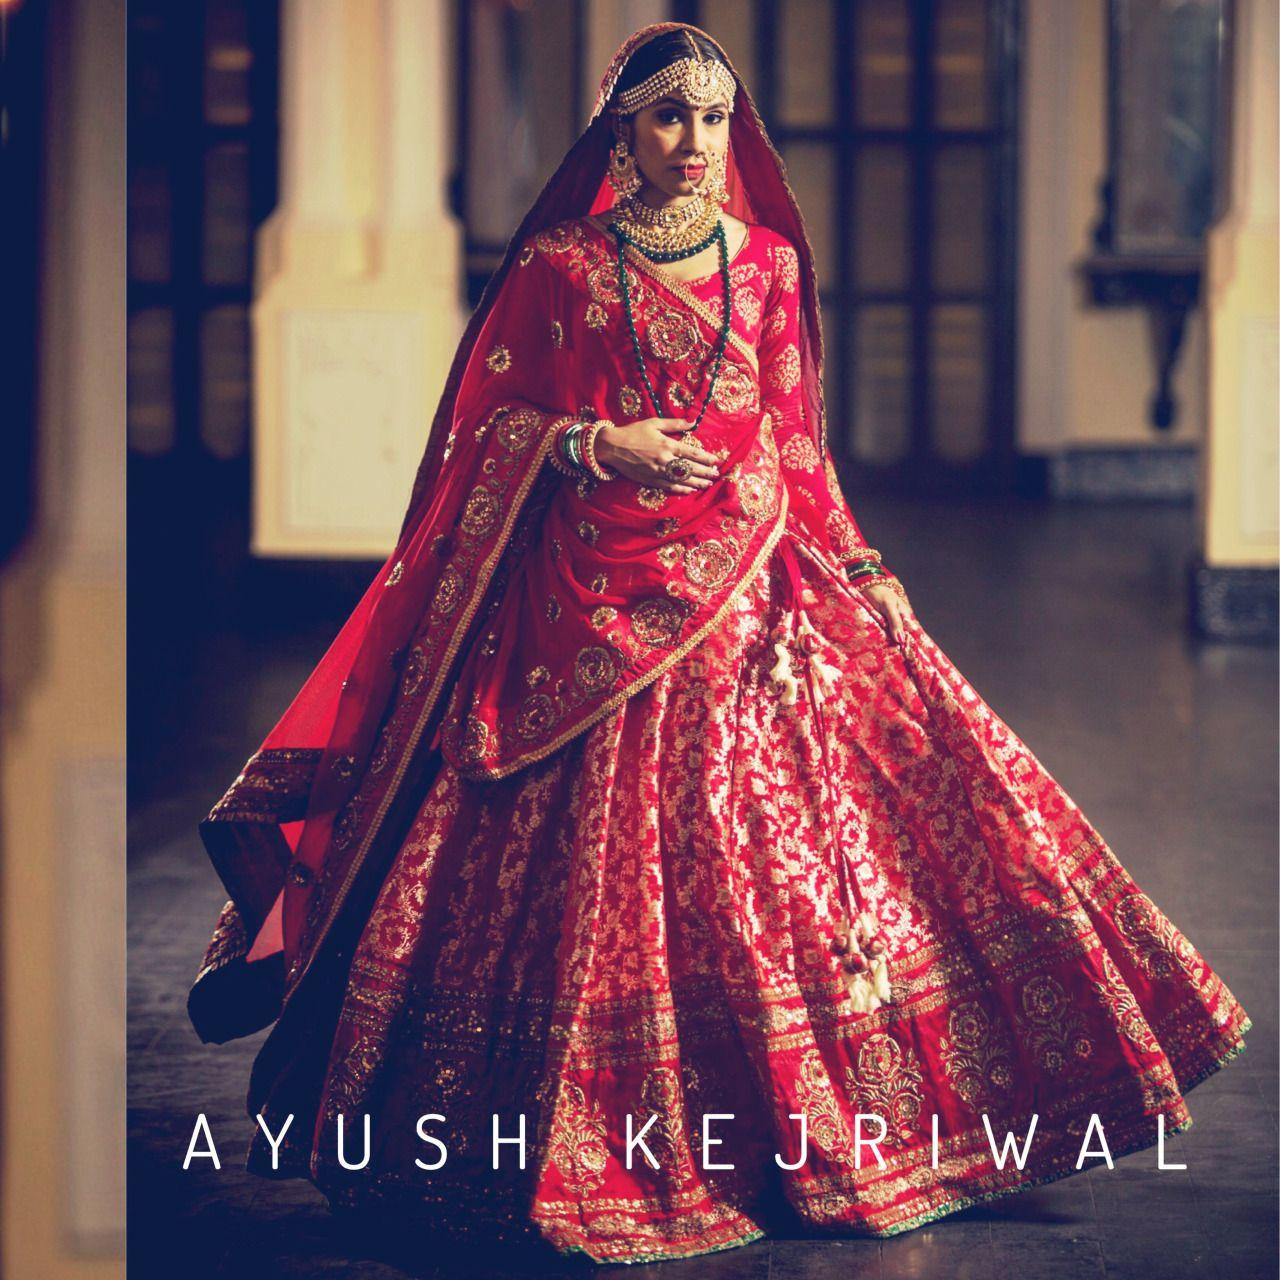 Sari wedding dress   Tips To Get An Expensive Wedding Lehenga For Less  Shade